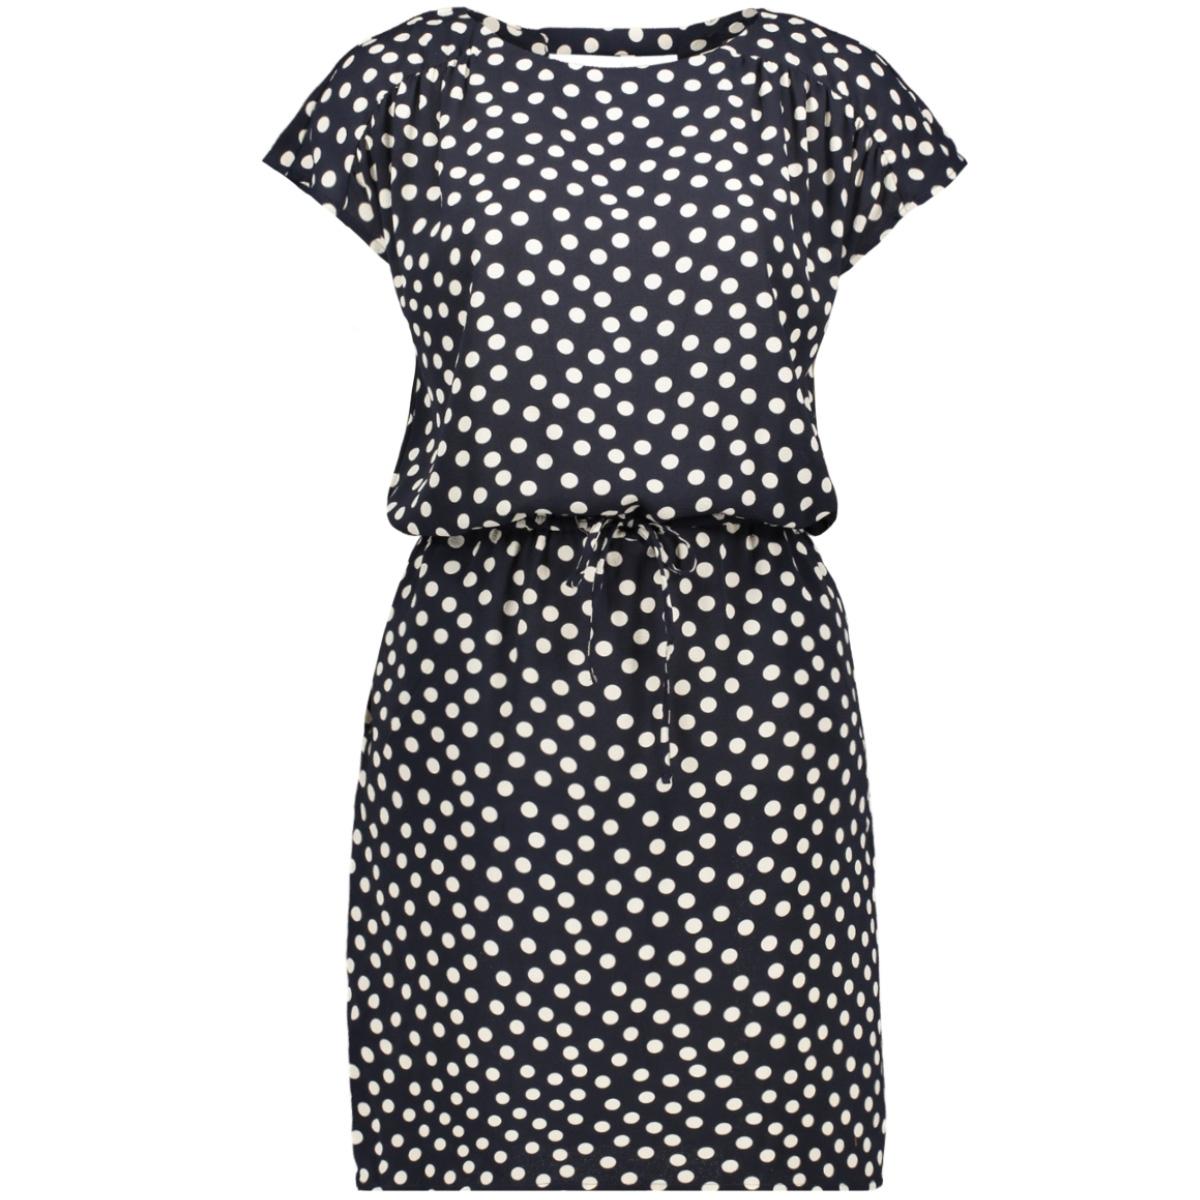 vmsasha bali s/s short dress aop 10224661 vero moda jurk night sky/dot